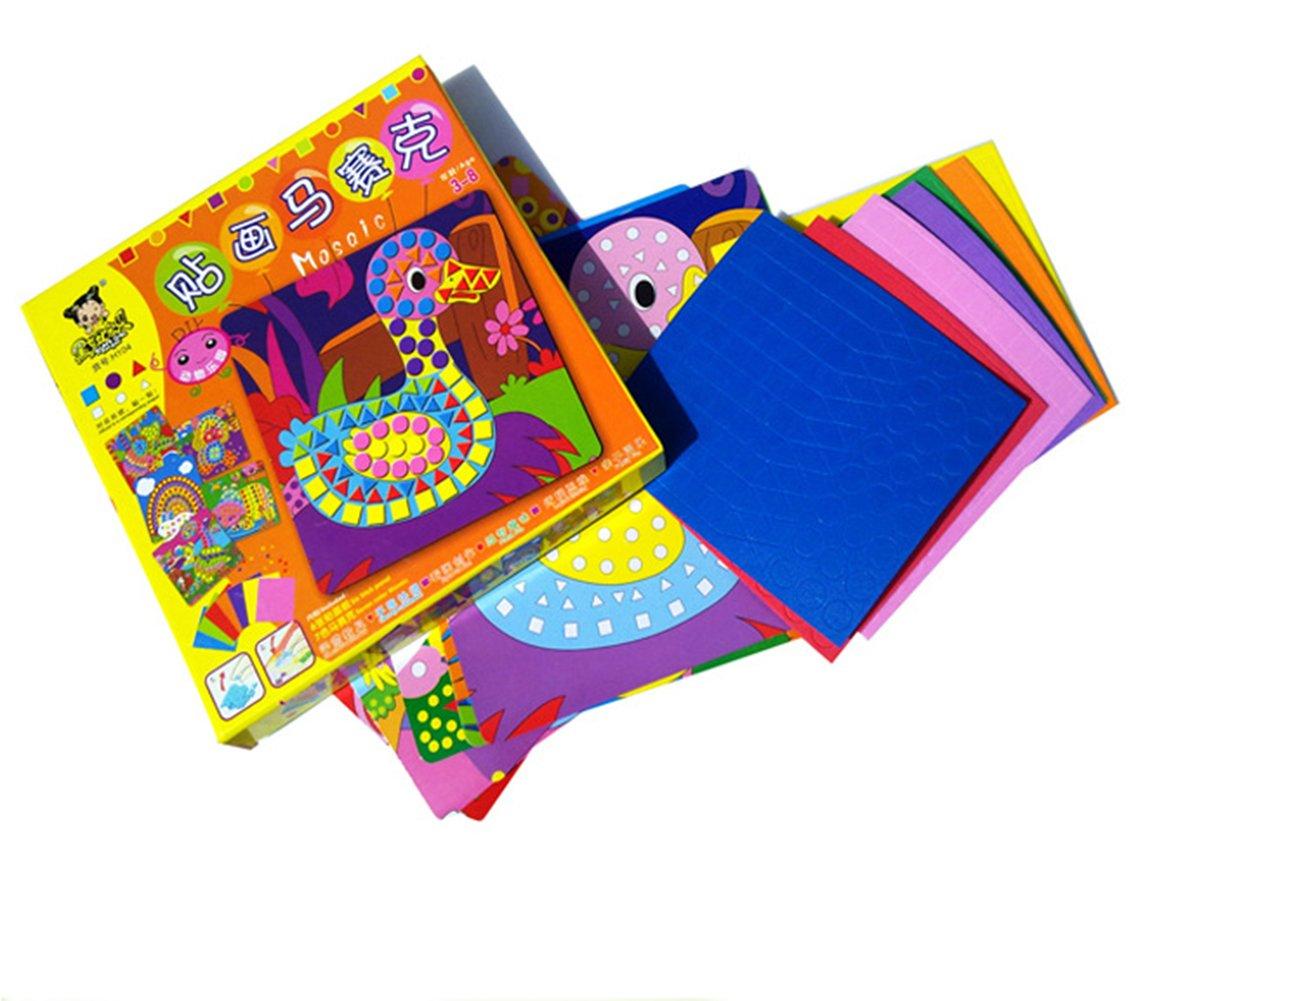 Biowow Animal Sticky Mosaics Art and Craft Kits for Kids,12 Packs